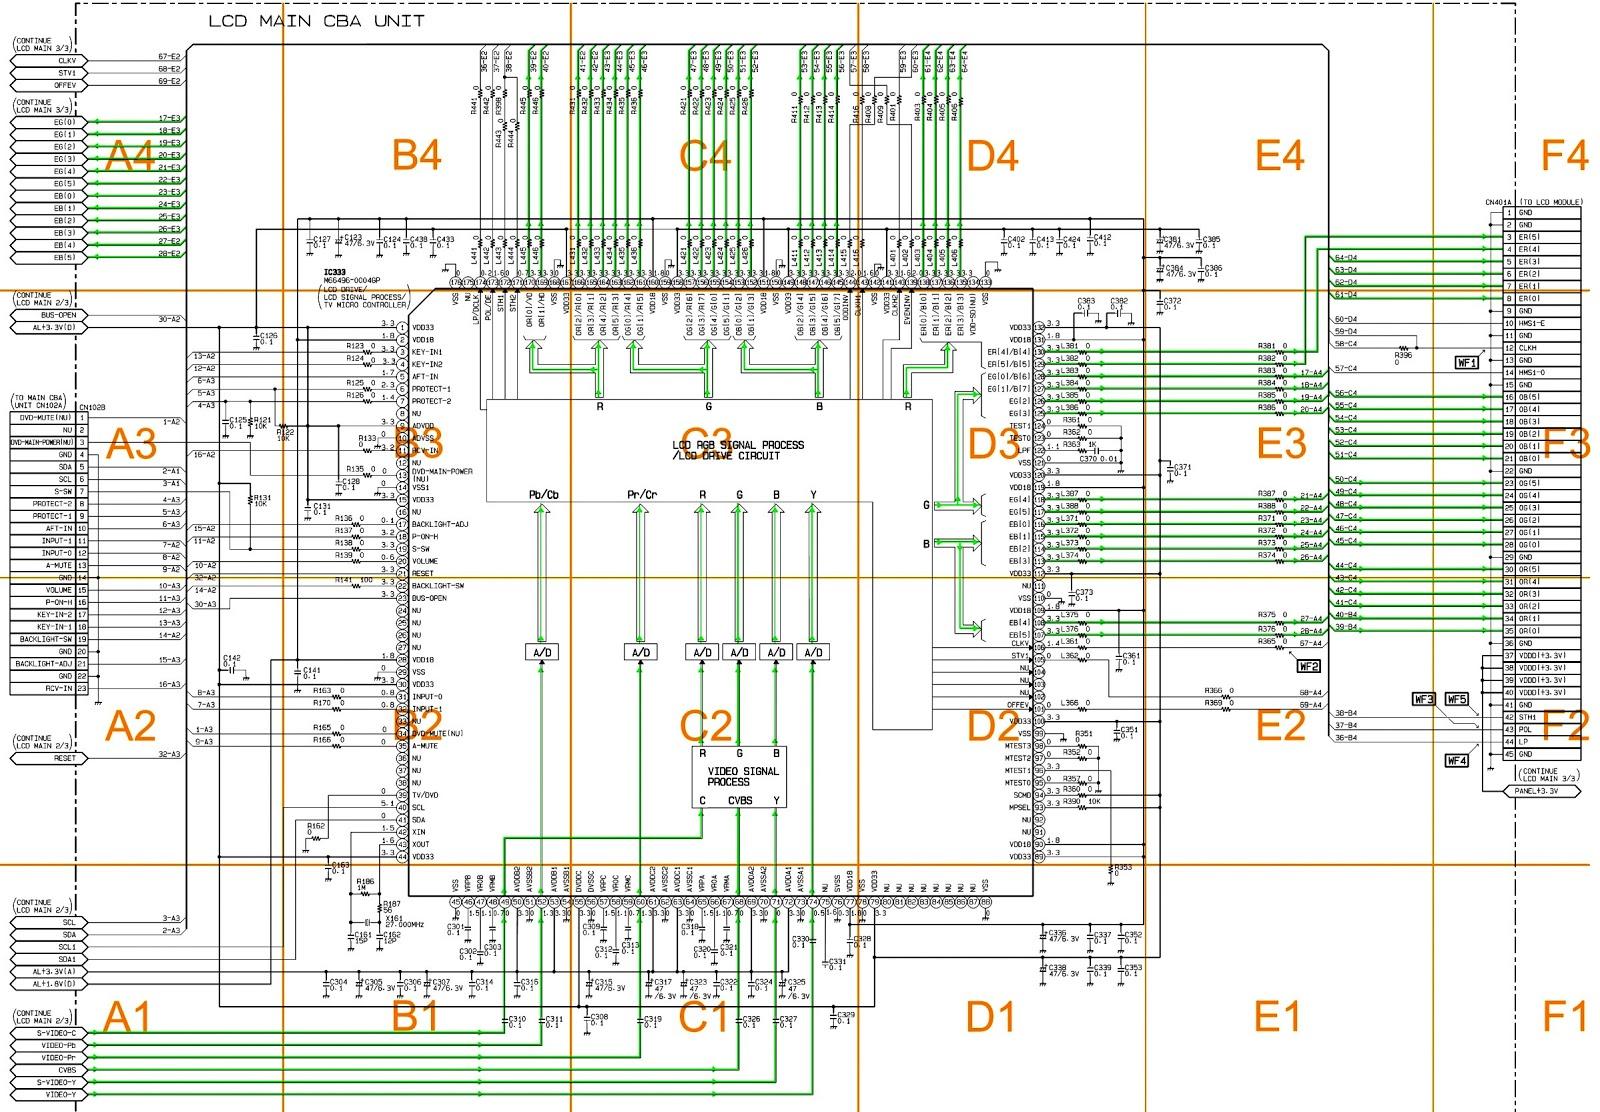 lg lcd tv circuit diagram lg image wiring diagram sylvania c6615le 15 inch color lcd television circuit diagram on lg lcd tv circuit diagram